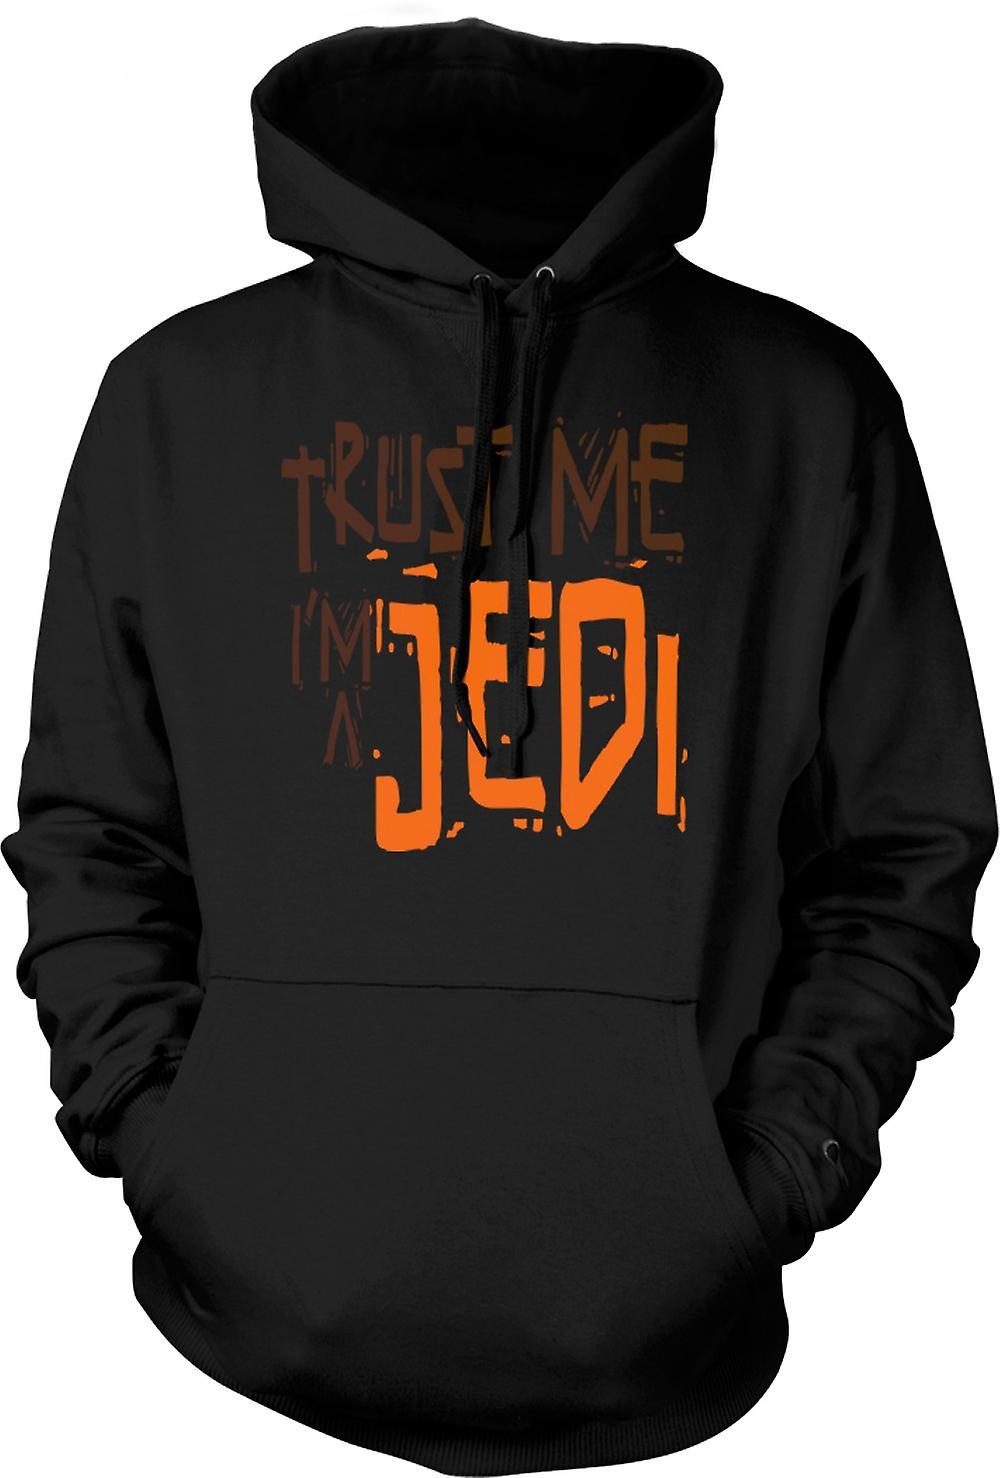 Kids Hoodie - Trust Me I'm A Jedi - Funny